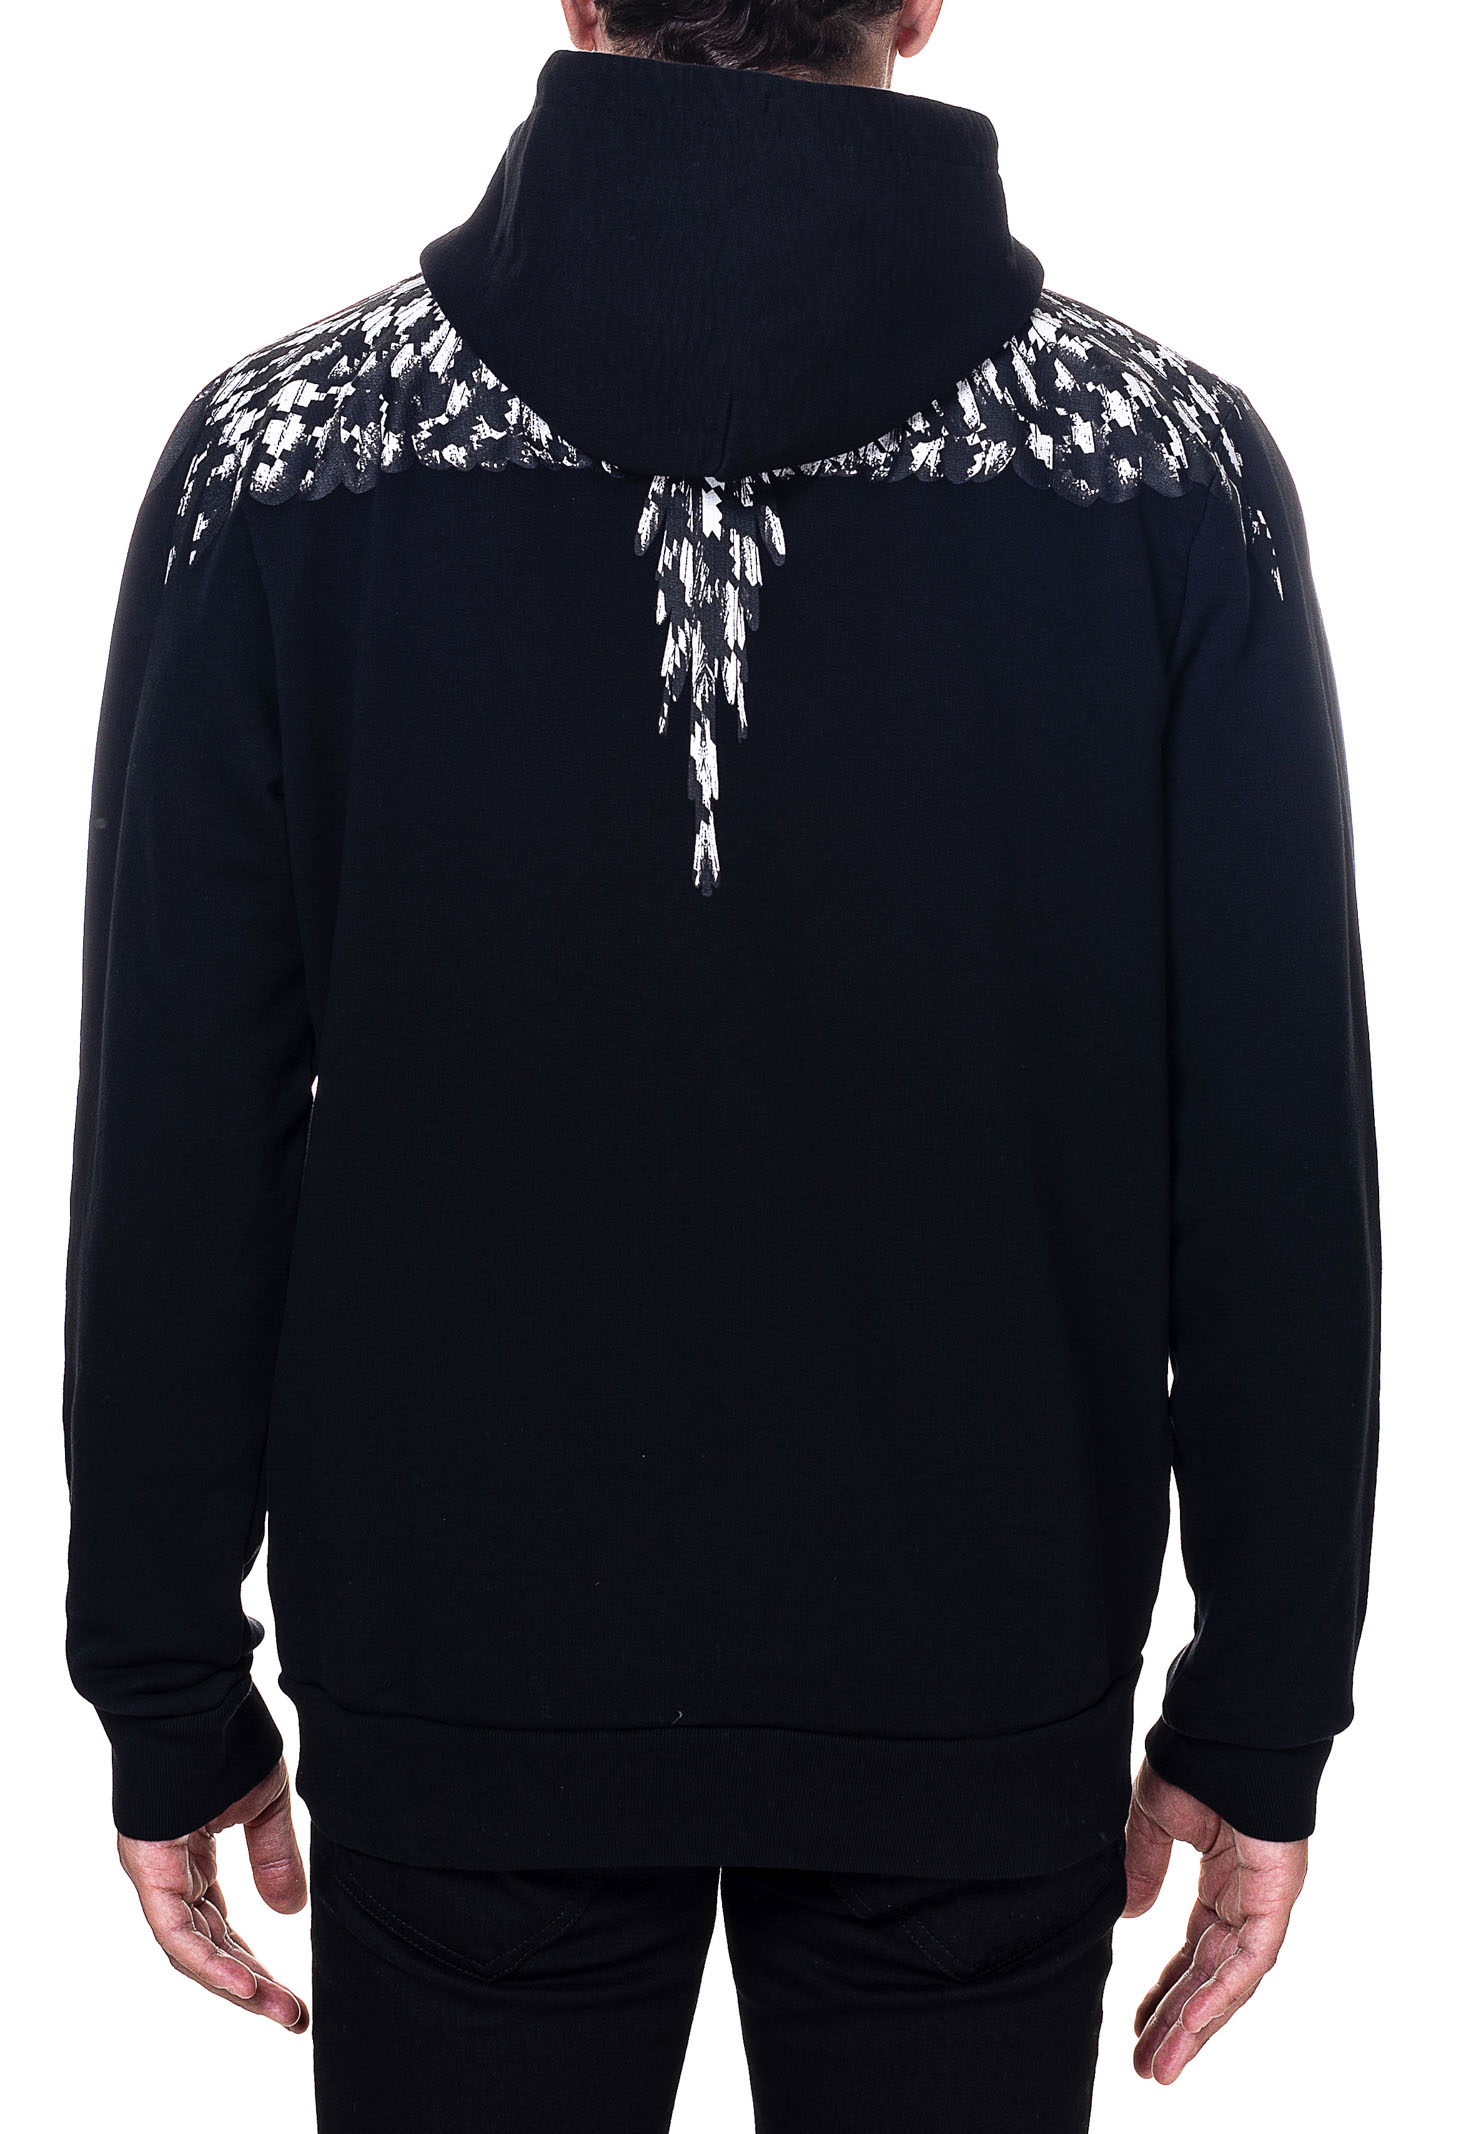 BLACK COTTON SWEATSHIRT WITH CROSS PDP WINGS PRINT MARCELO BURLON | Sweatshirts | CMBB007F20FLE0031010